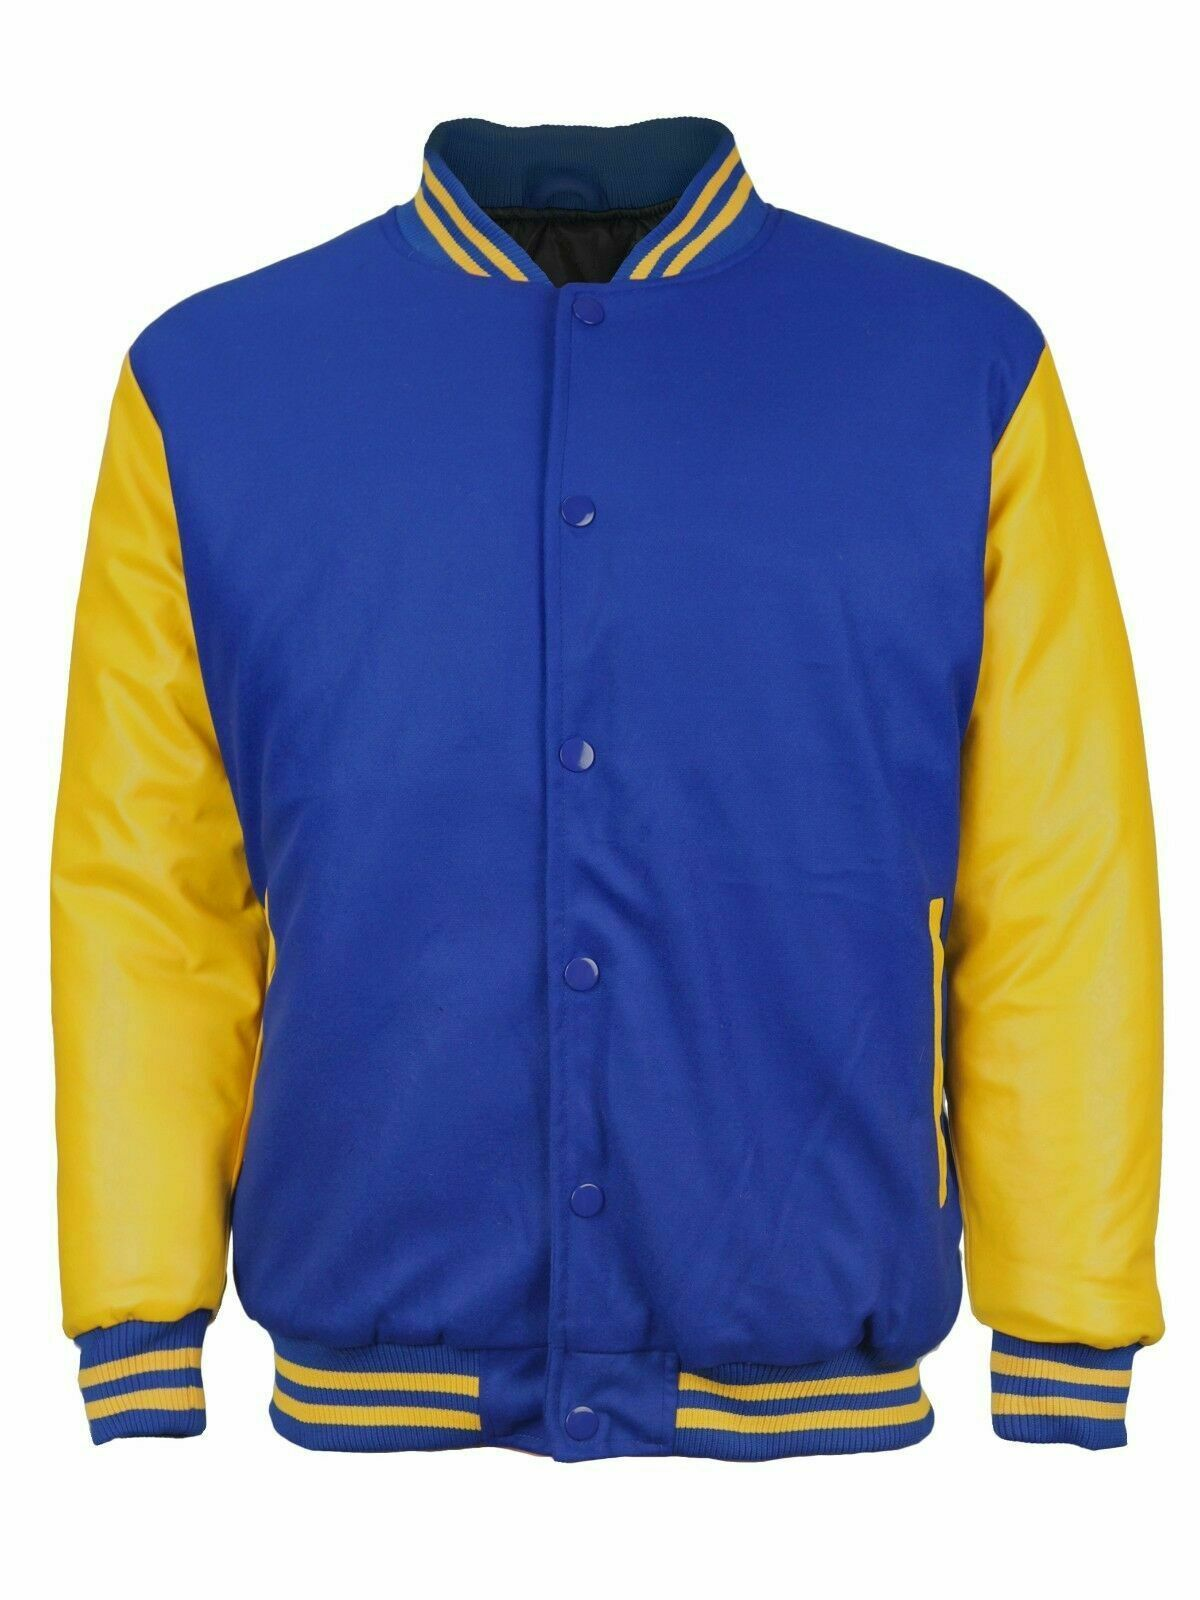 Men's Classic Snap Button Vintage Baseball Letterman Varsity Jacket w/ Defects